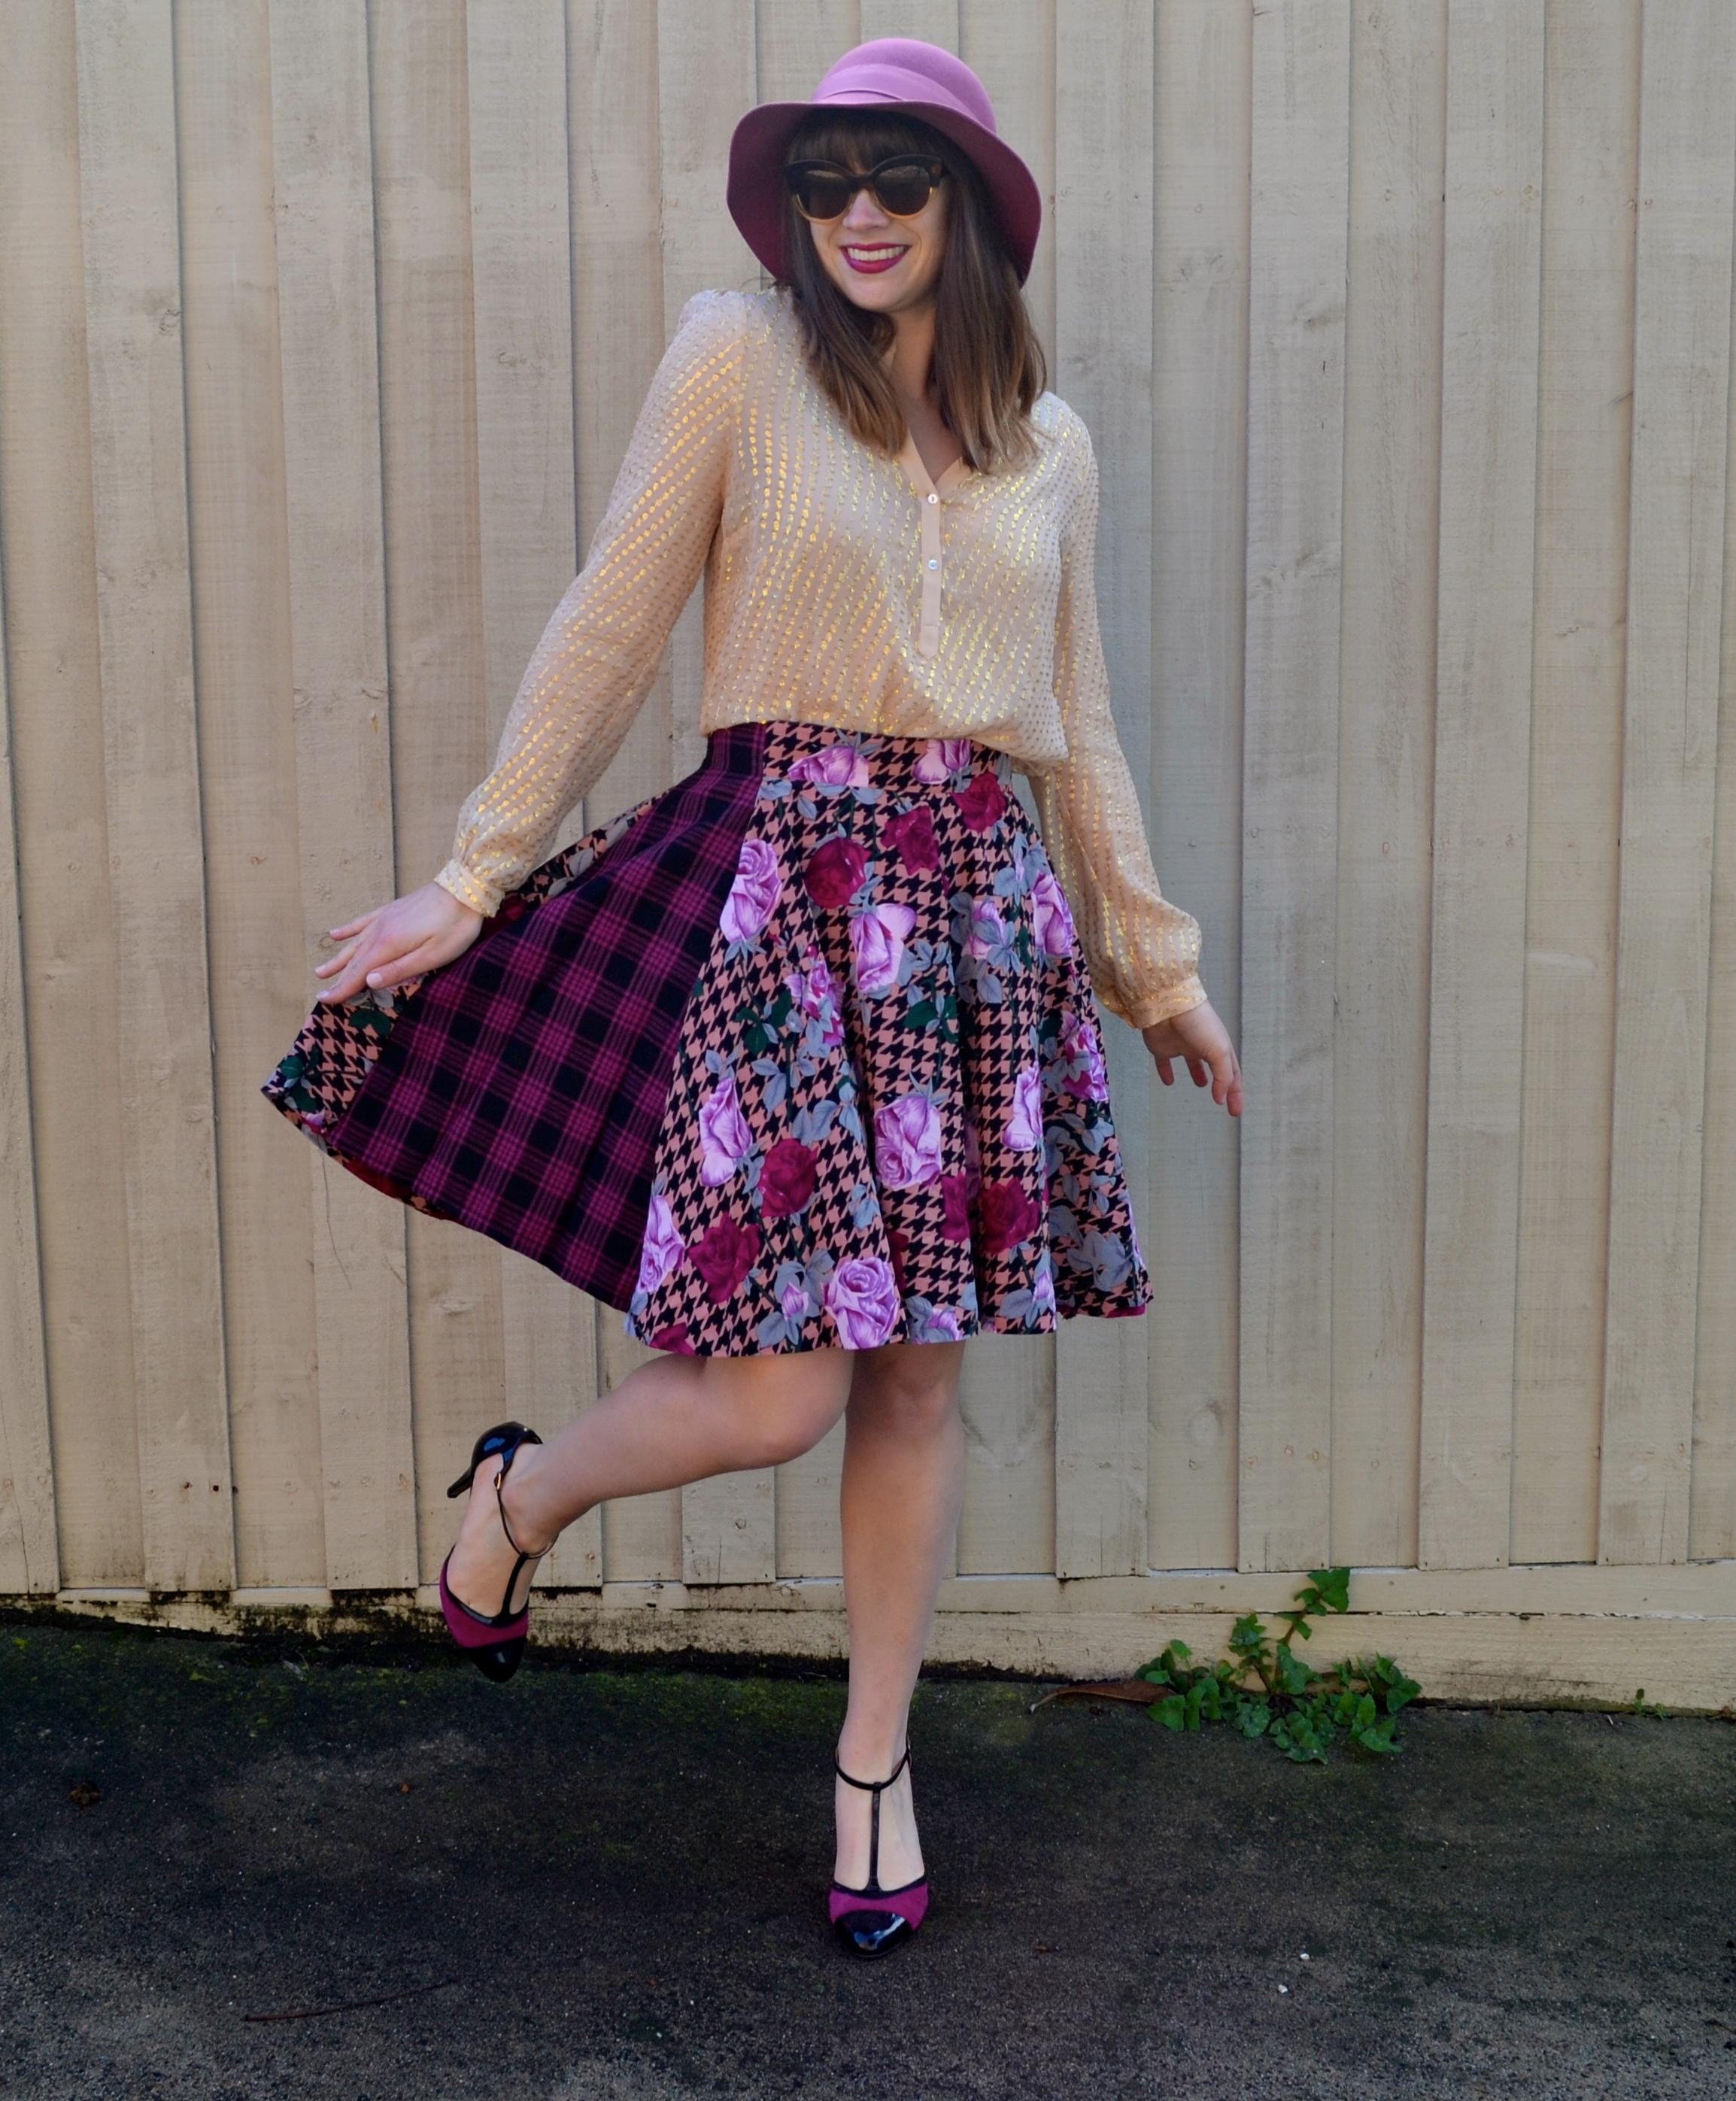 pink-patterned-skirt-heels